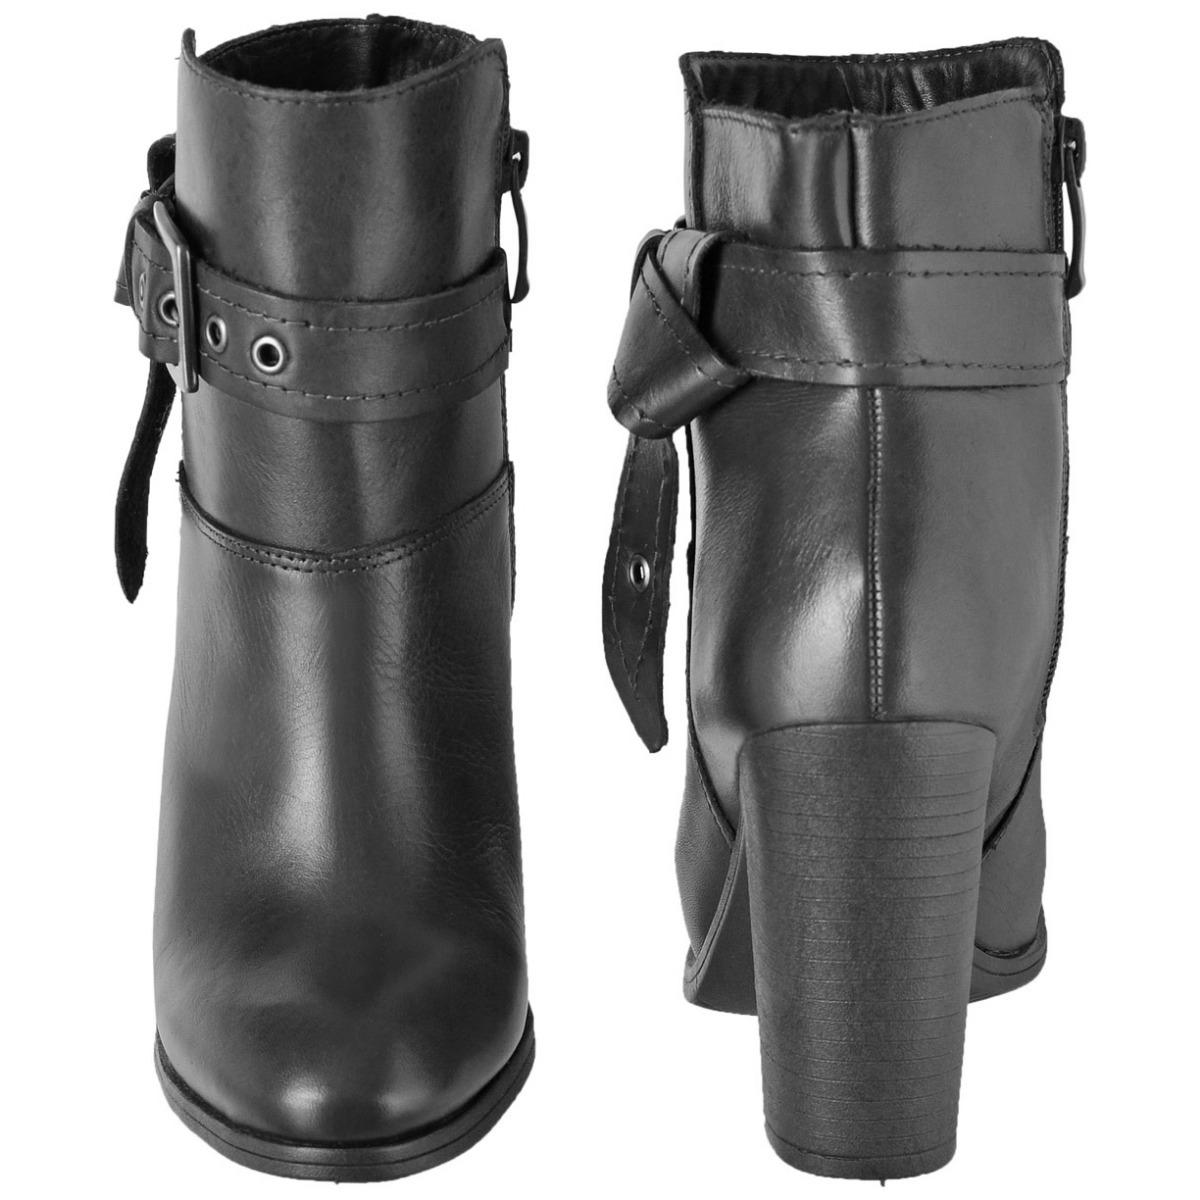 a4de111691 bota feminina cano curto couro legítimo fivela lateral c72cb. Carregando  zoom.